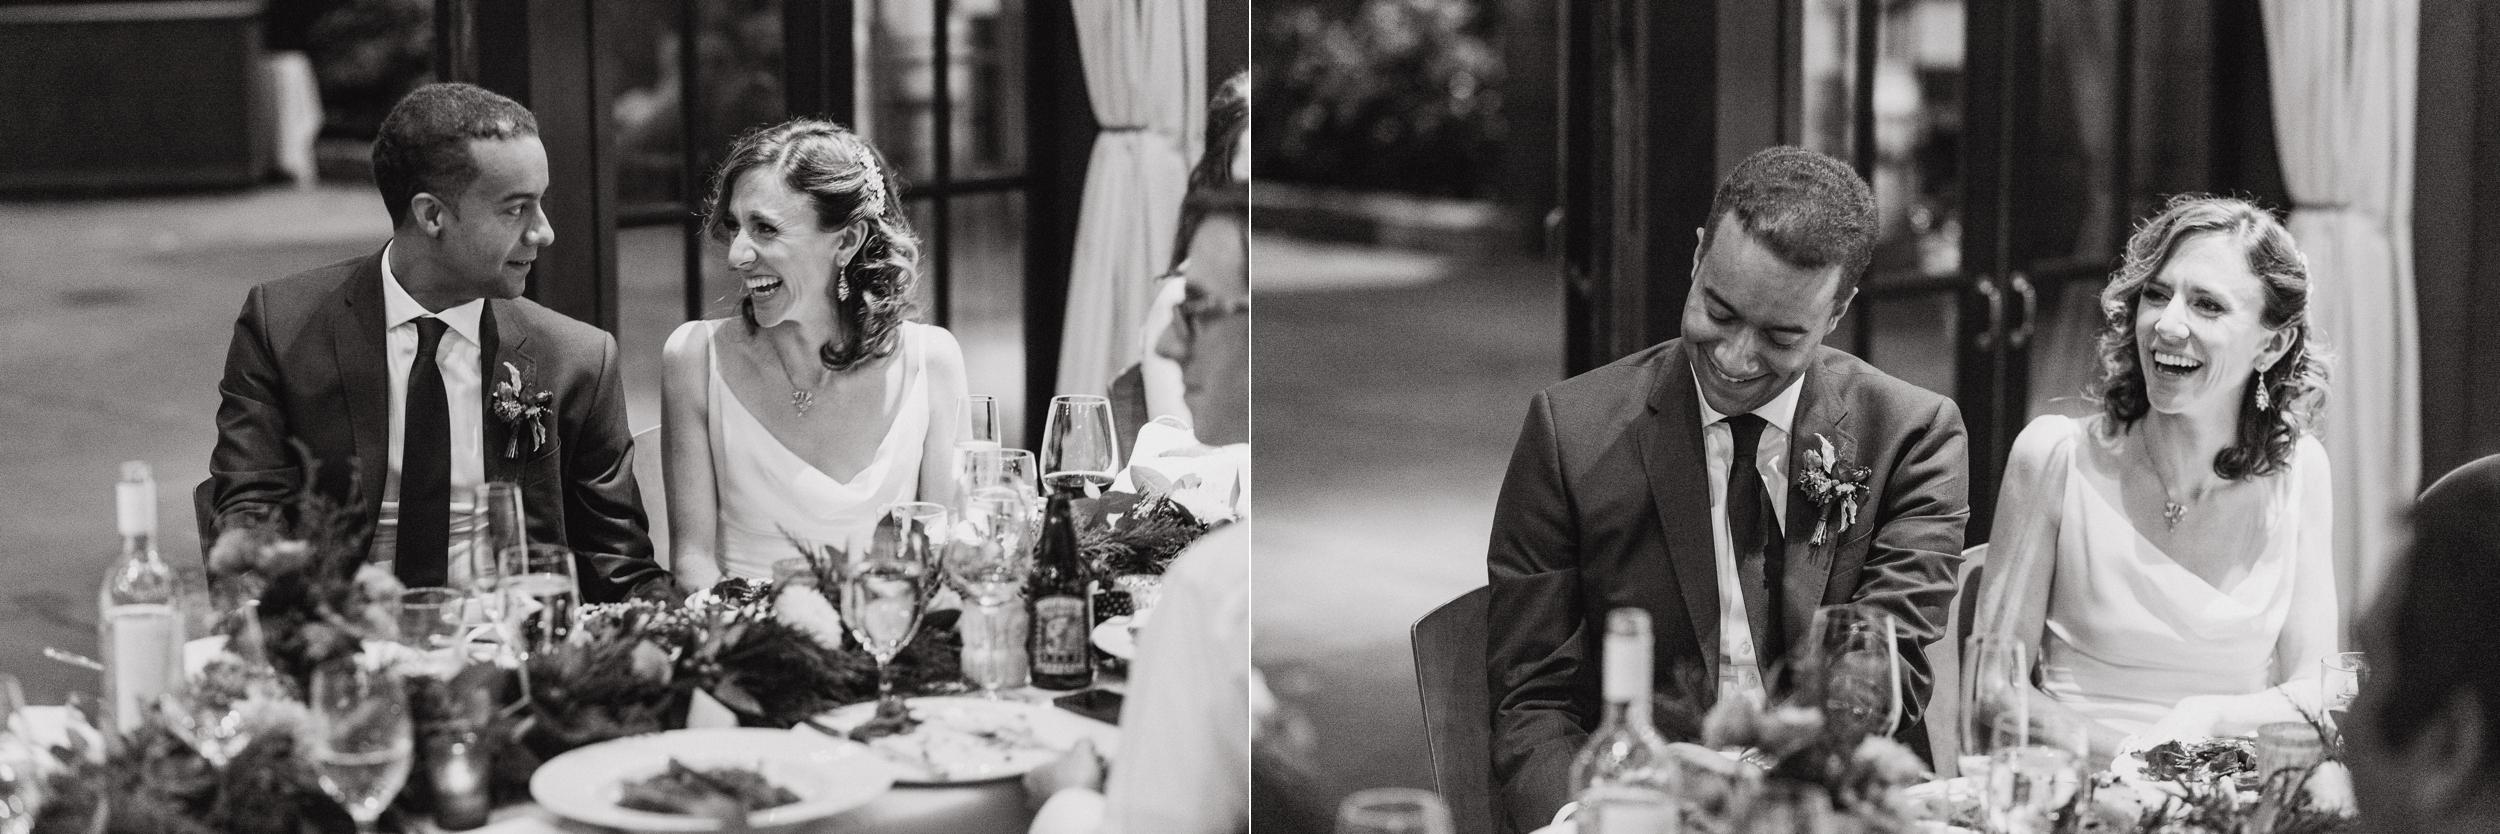 73-outdoor-art-club-wedding-vivianchen-607_WEB.jpg